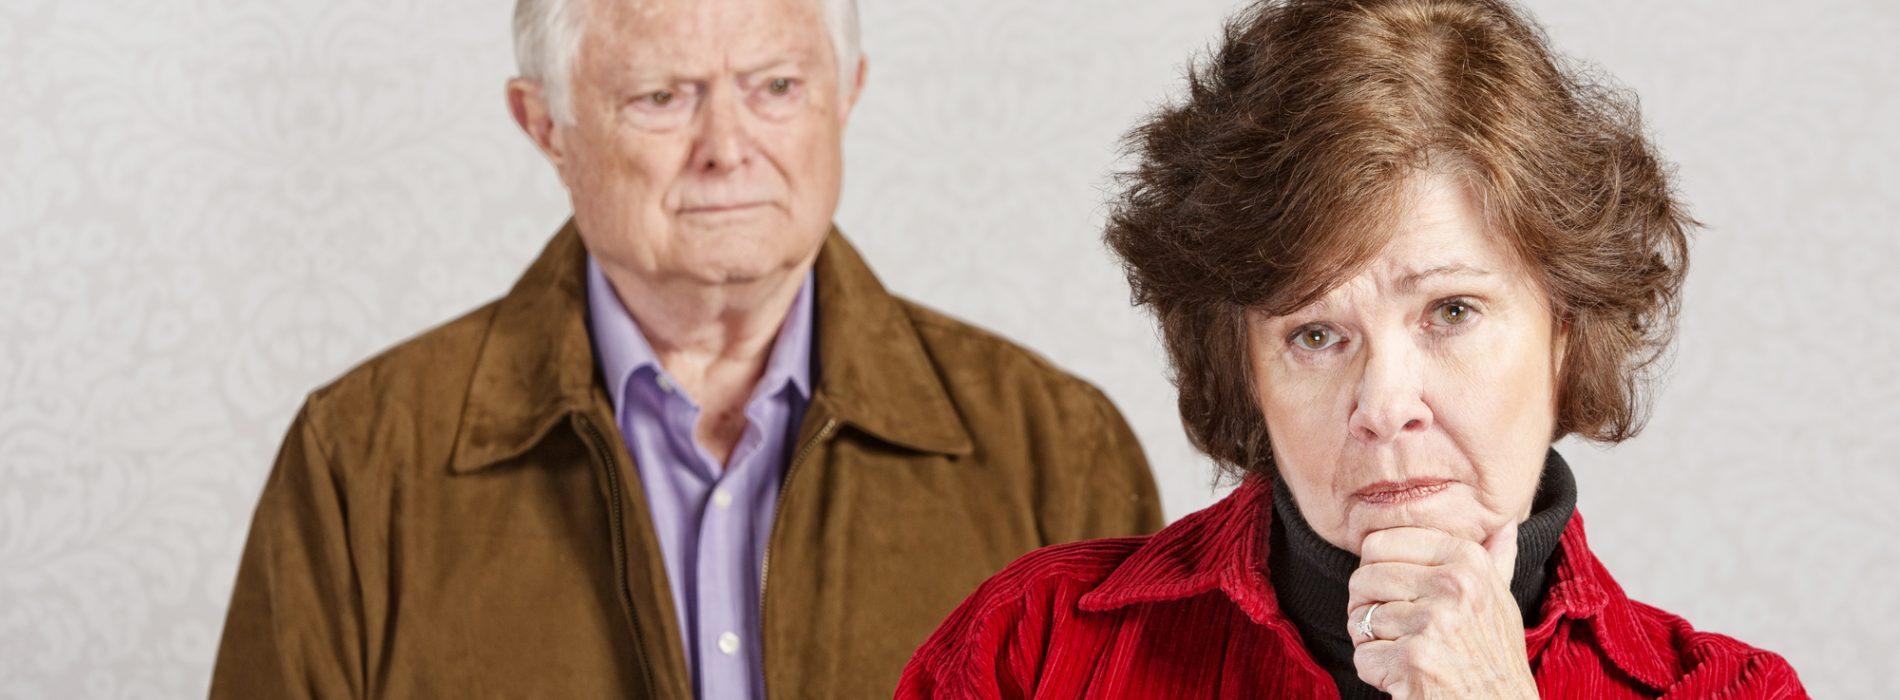 Four Ways Divorce Affects Older Couples